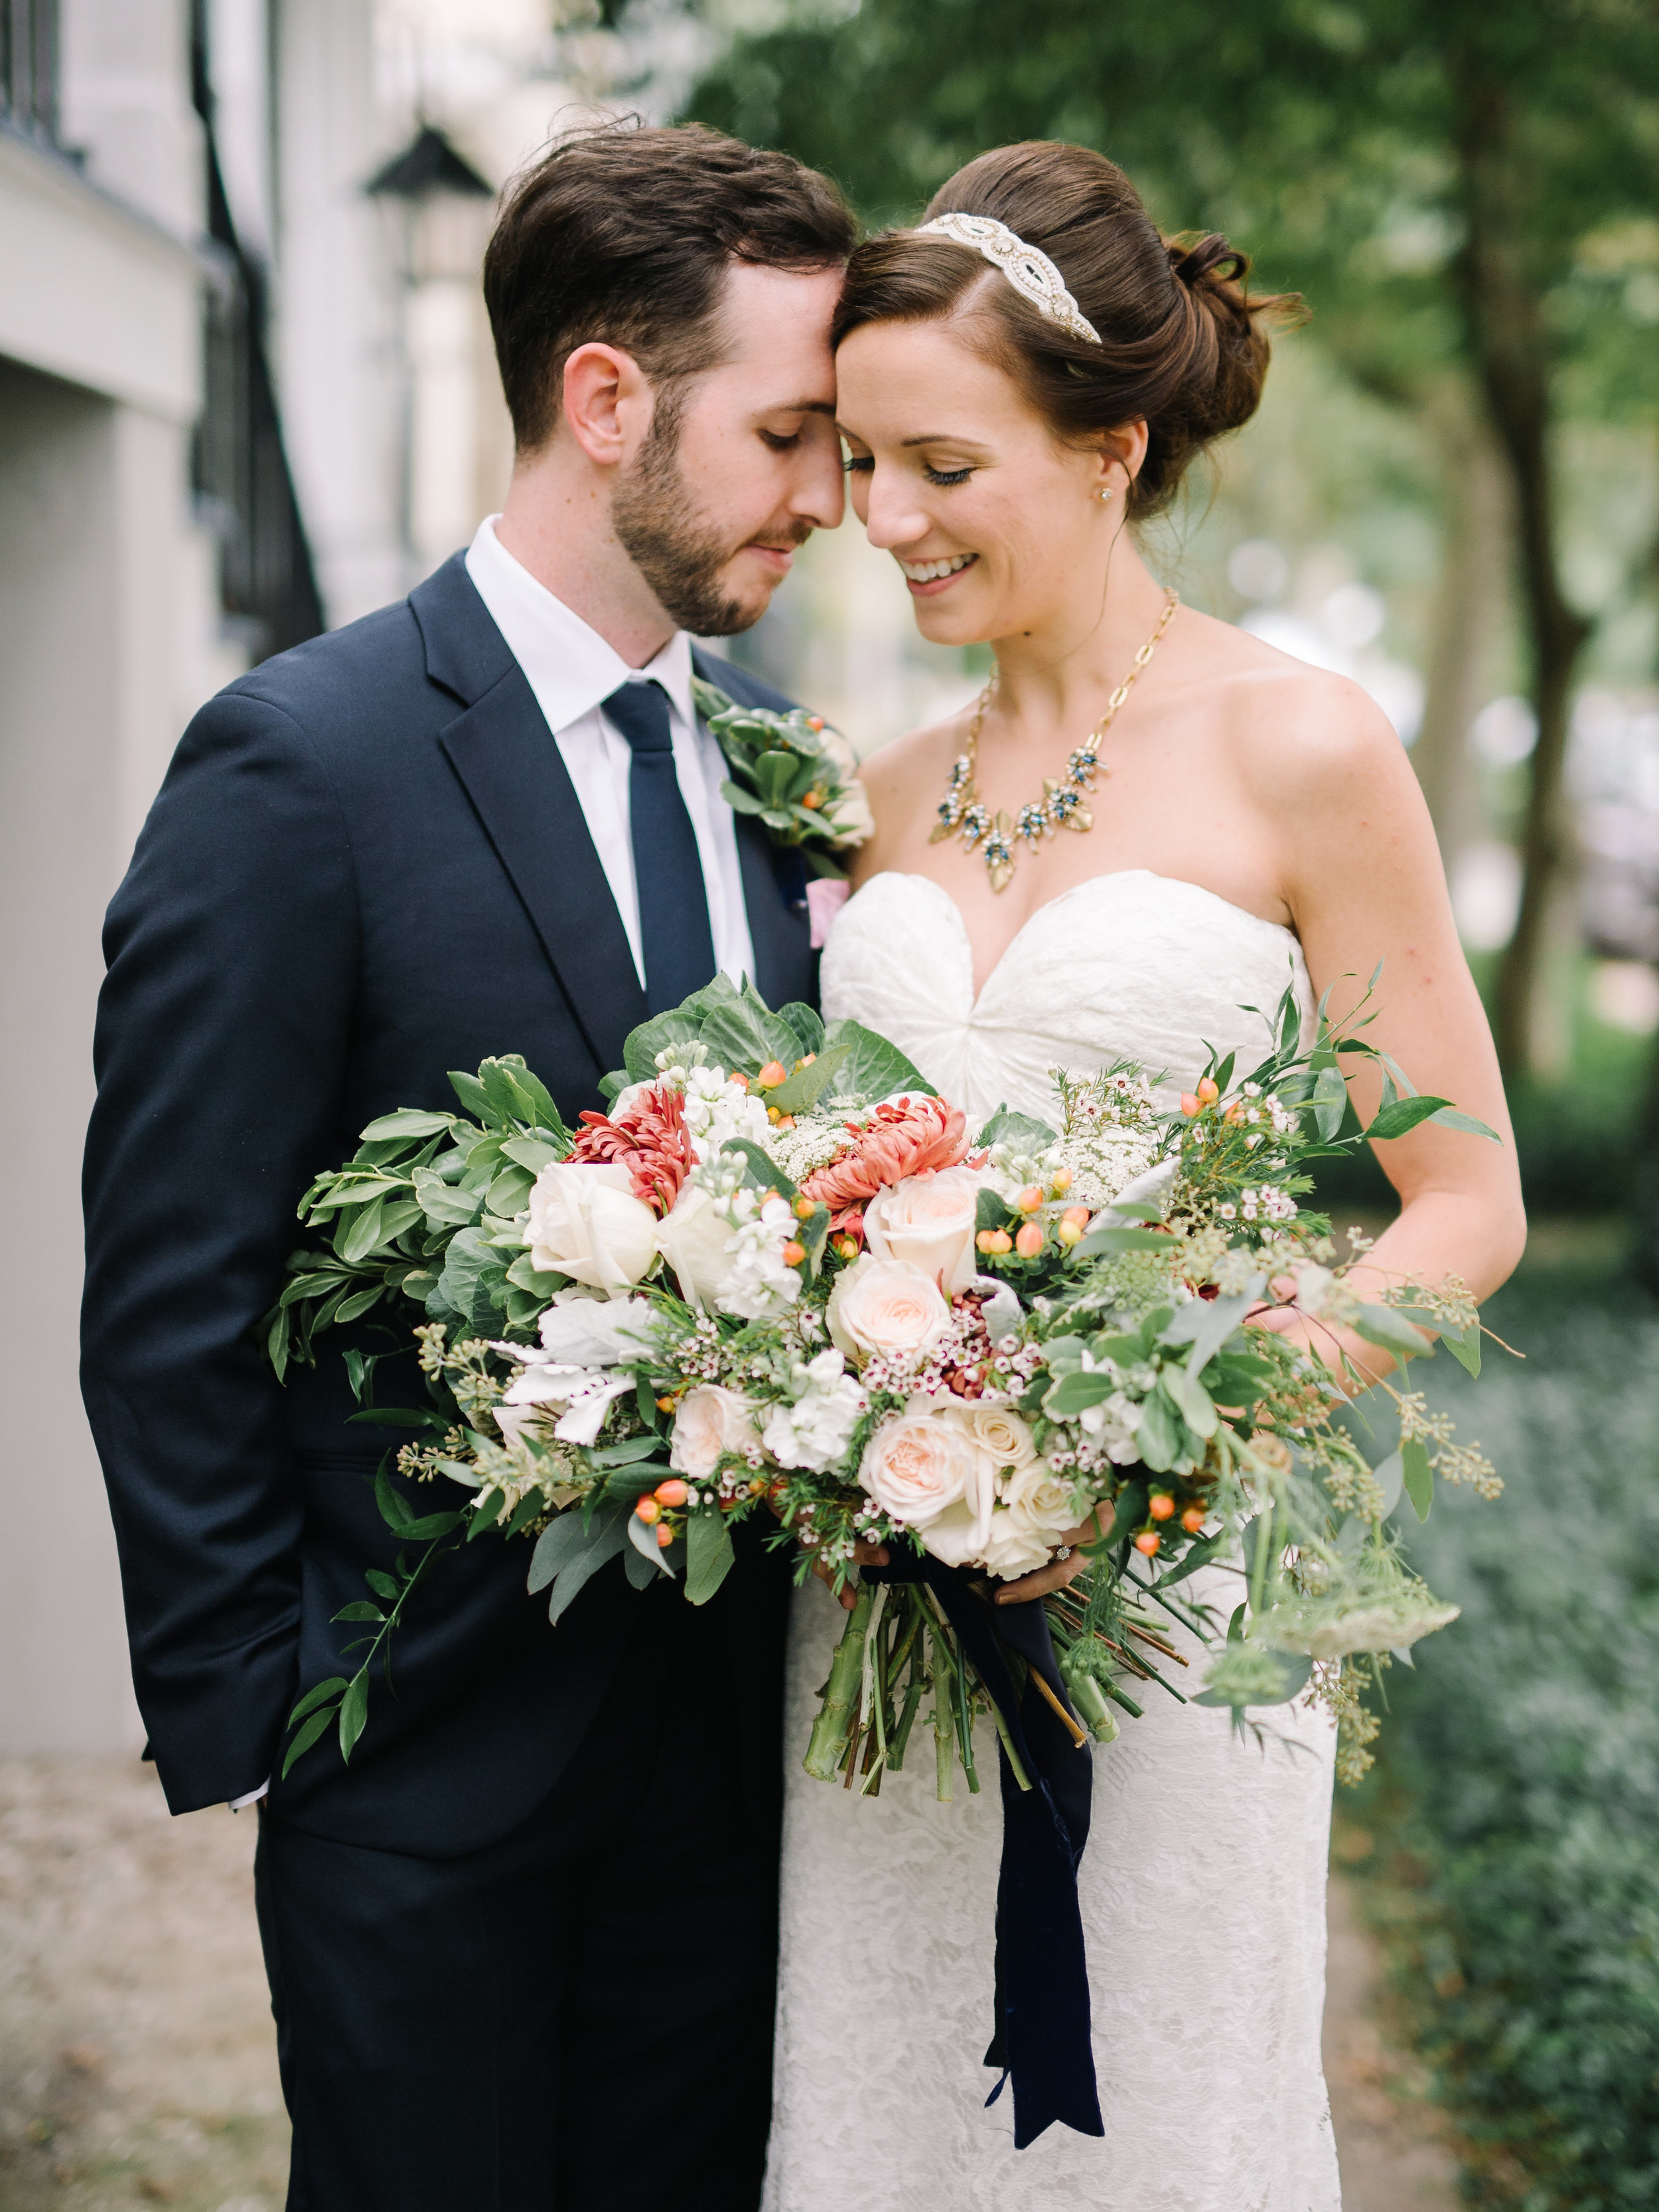 amber-and-paul-rach-loves-troy-charles-h-morris-center-wedding-sarah-seven-helene-lace-wedding-dress-ivory-and-beau-bridal-boutique-savannah-wedding-planner-savannah-event-designer-savannah-florist-savannah-weddings-savannah-bridal-boutique-12.jpg